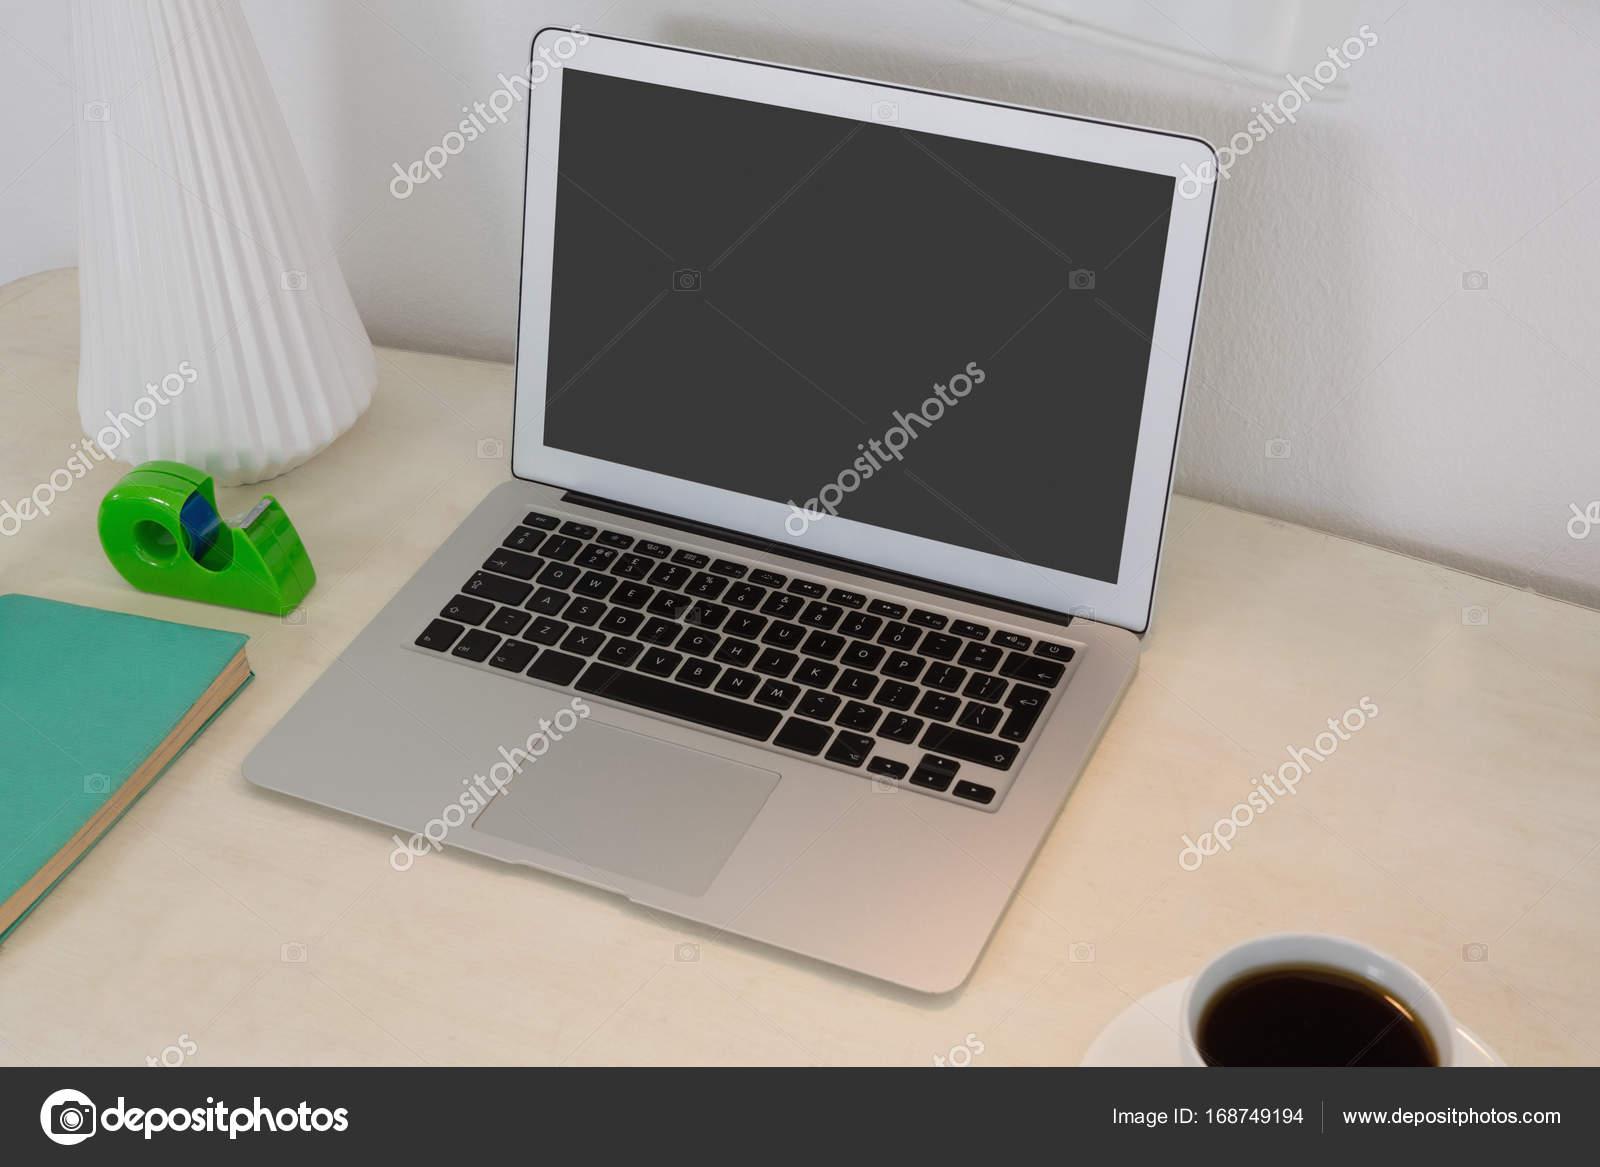 Accessori Per Ufficio : Accessori per ufficio e computer portatile sul tavolo u2014 foto stock